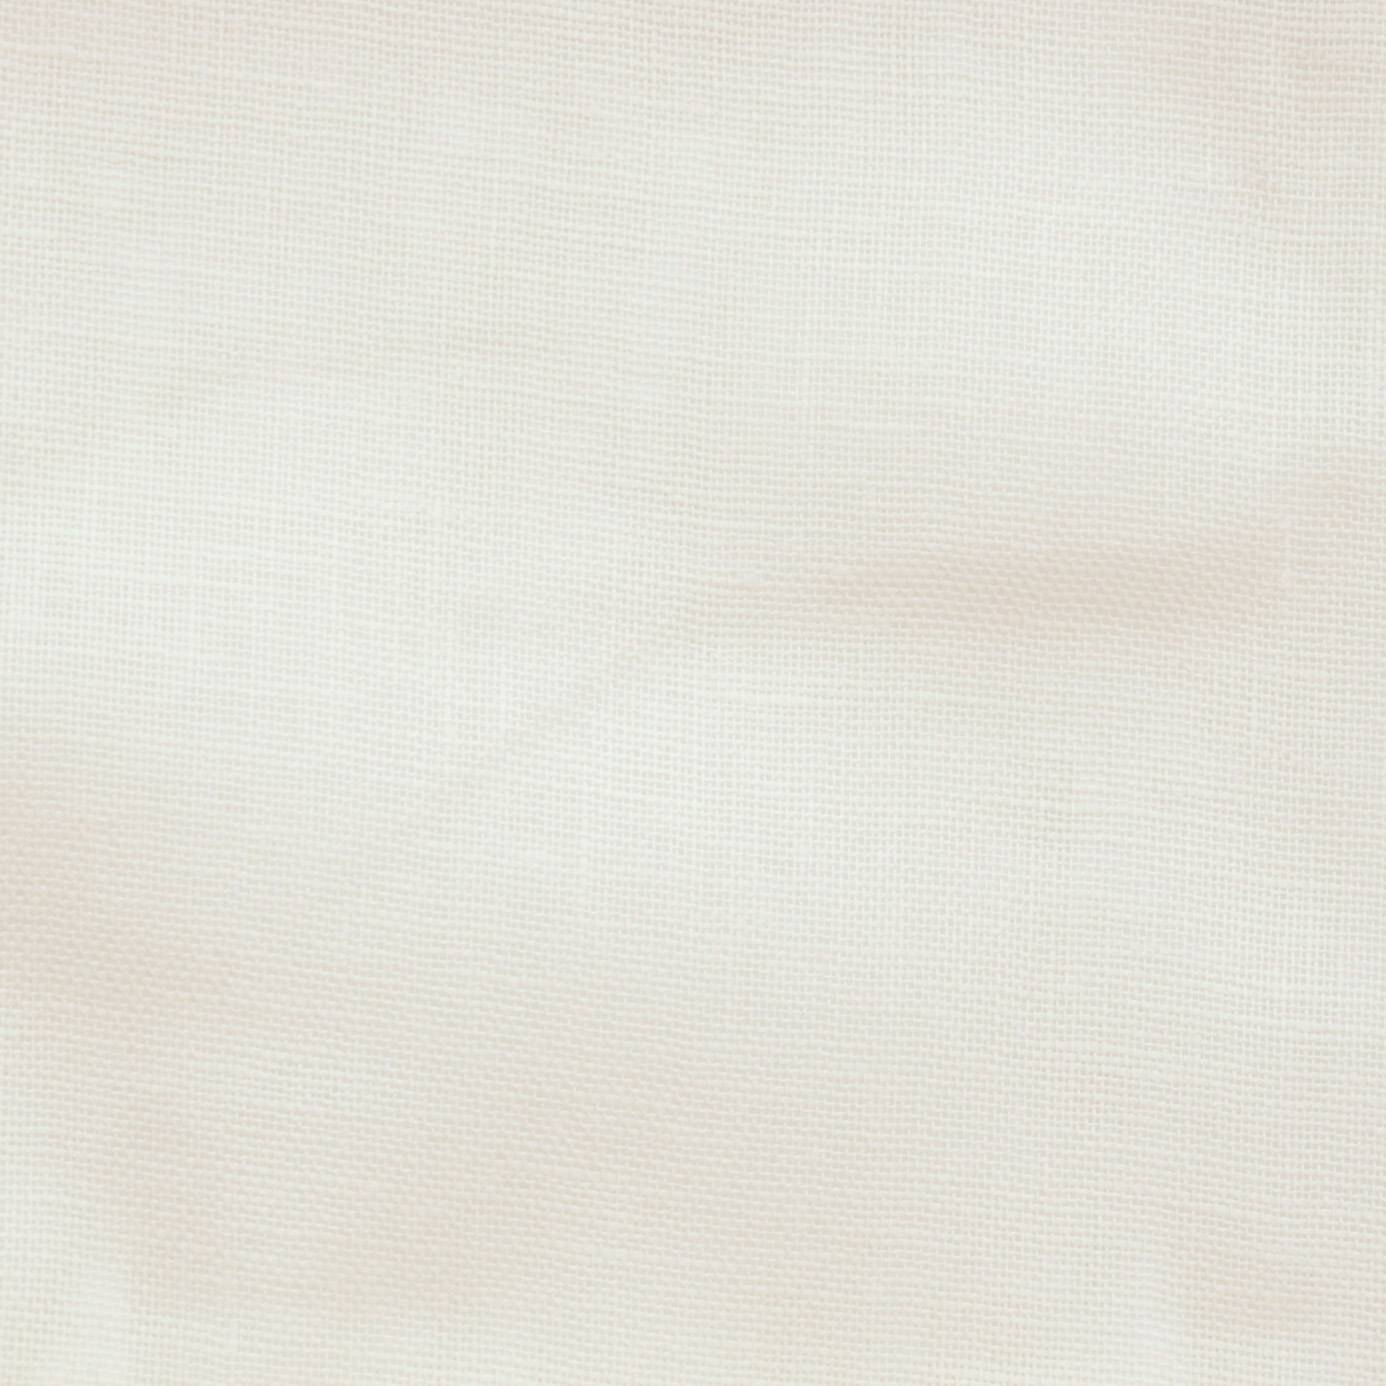 Lightweight Sheers Fabric Marble 243335 Sanderson Lightweight Sheers Fabric Collection